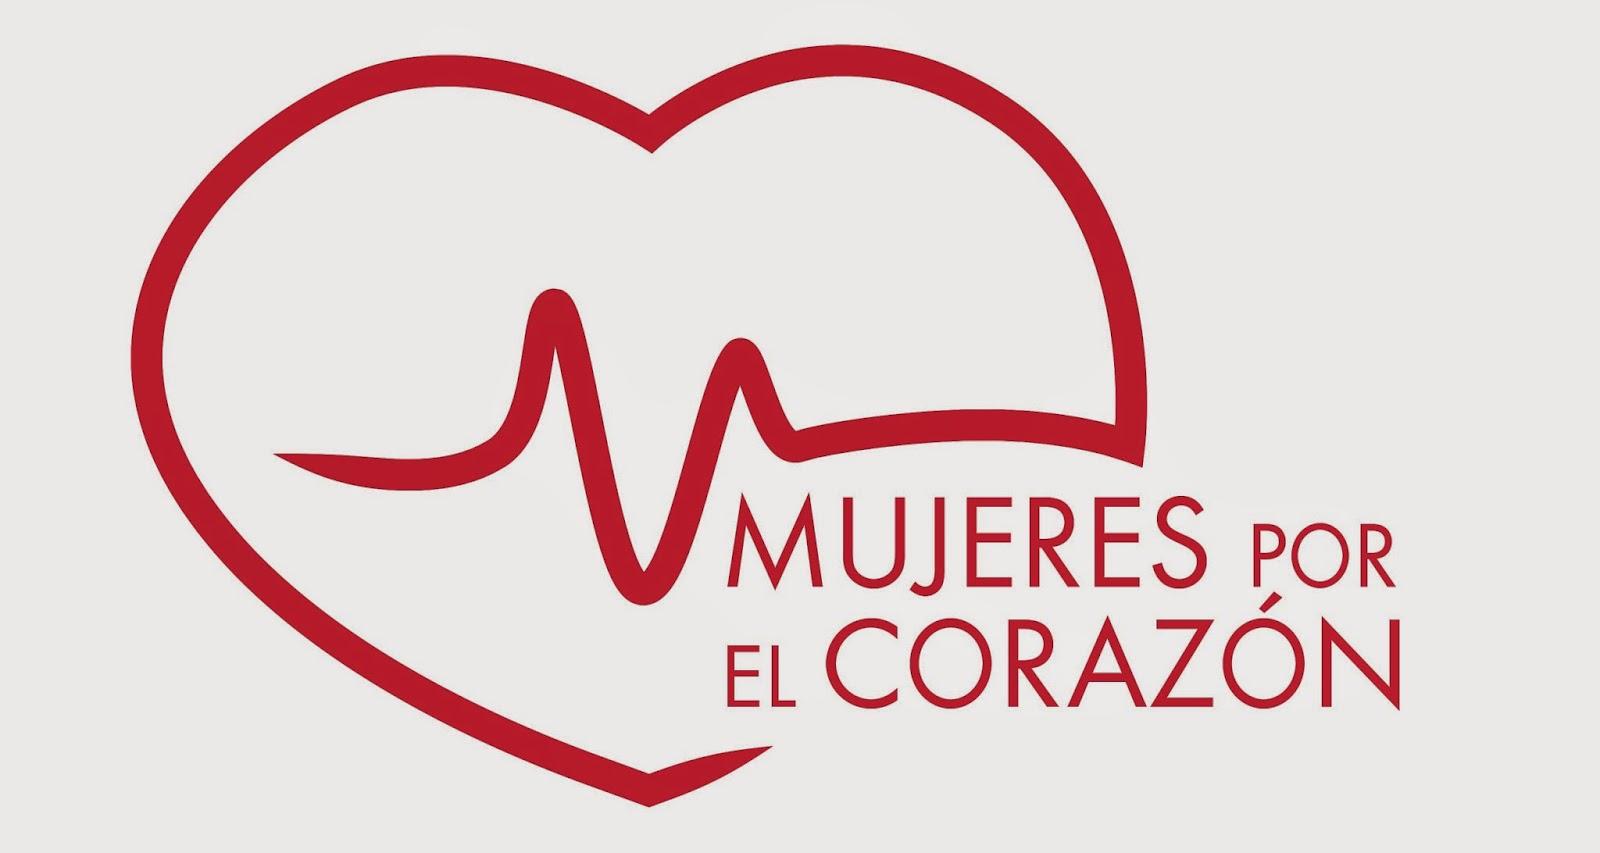 http://www.mujeresporelcorazon.org/